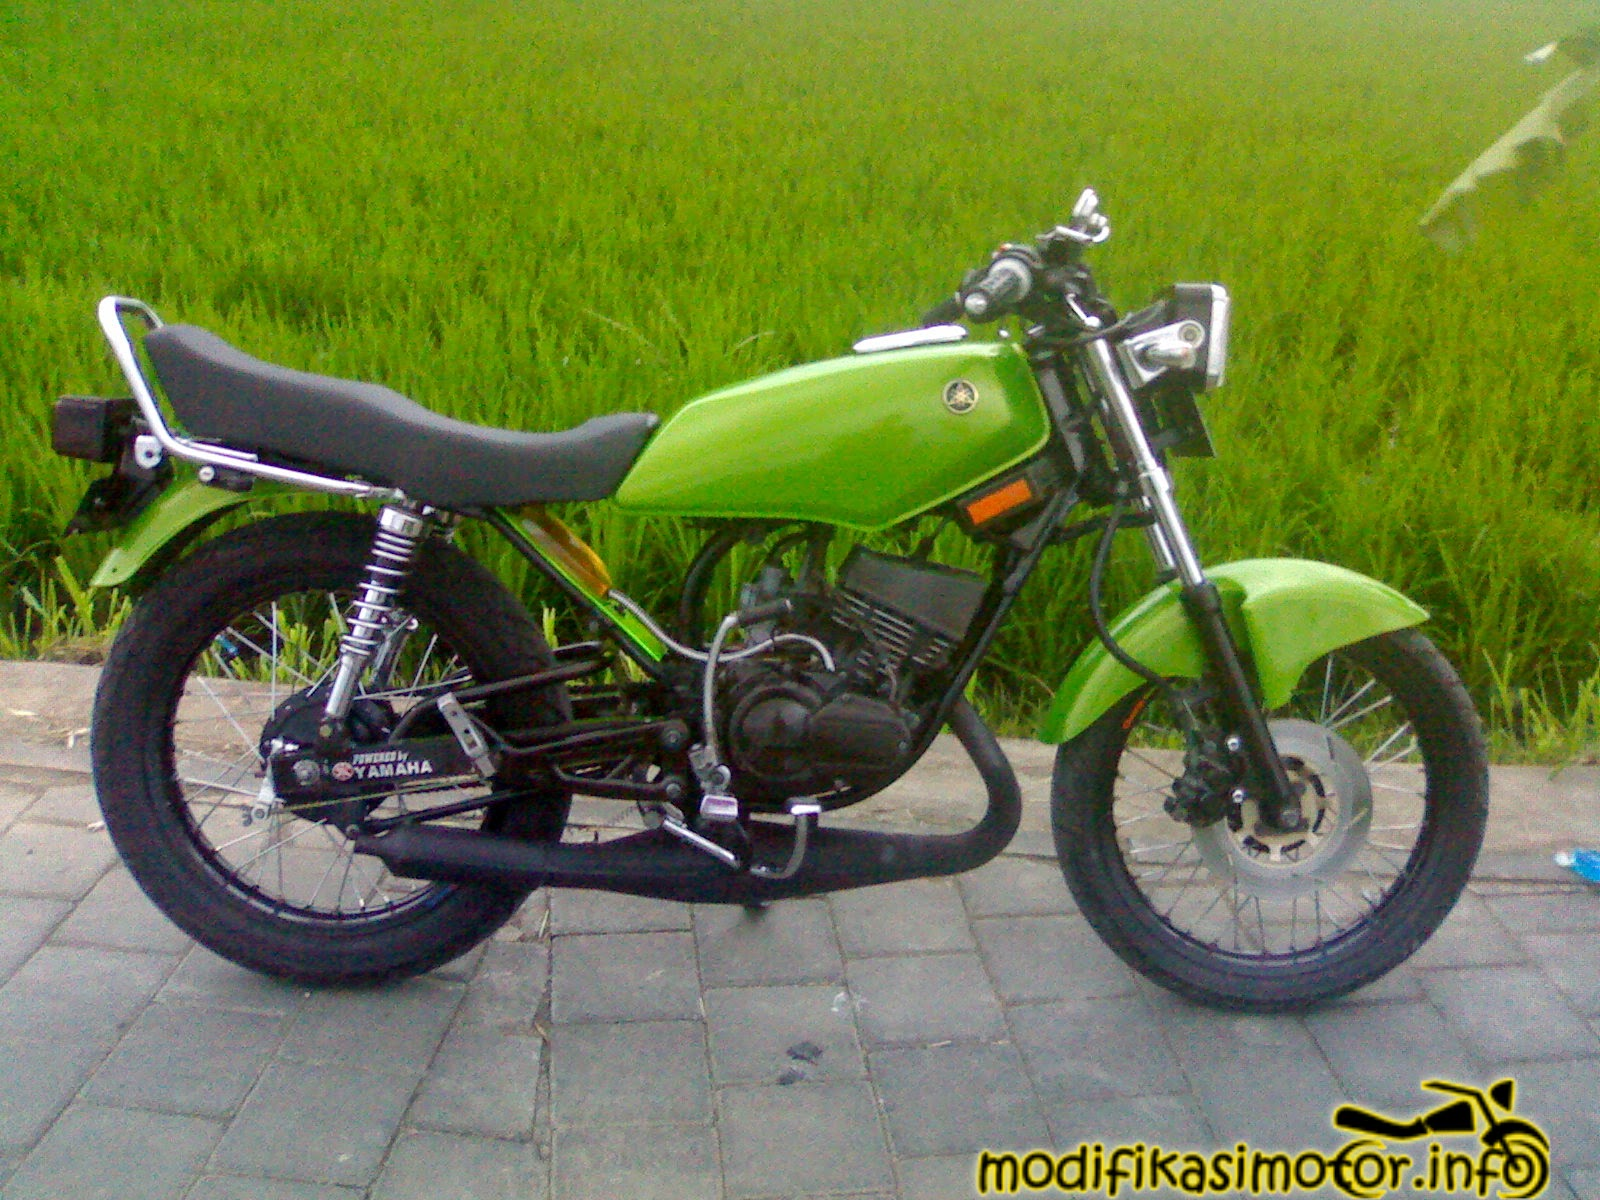 Lihat Foto Modifikasi Motor Rx King  Modif Yamaha